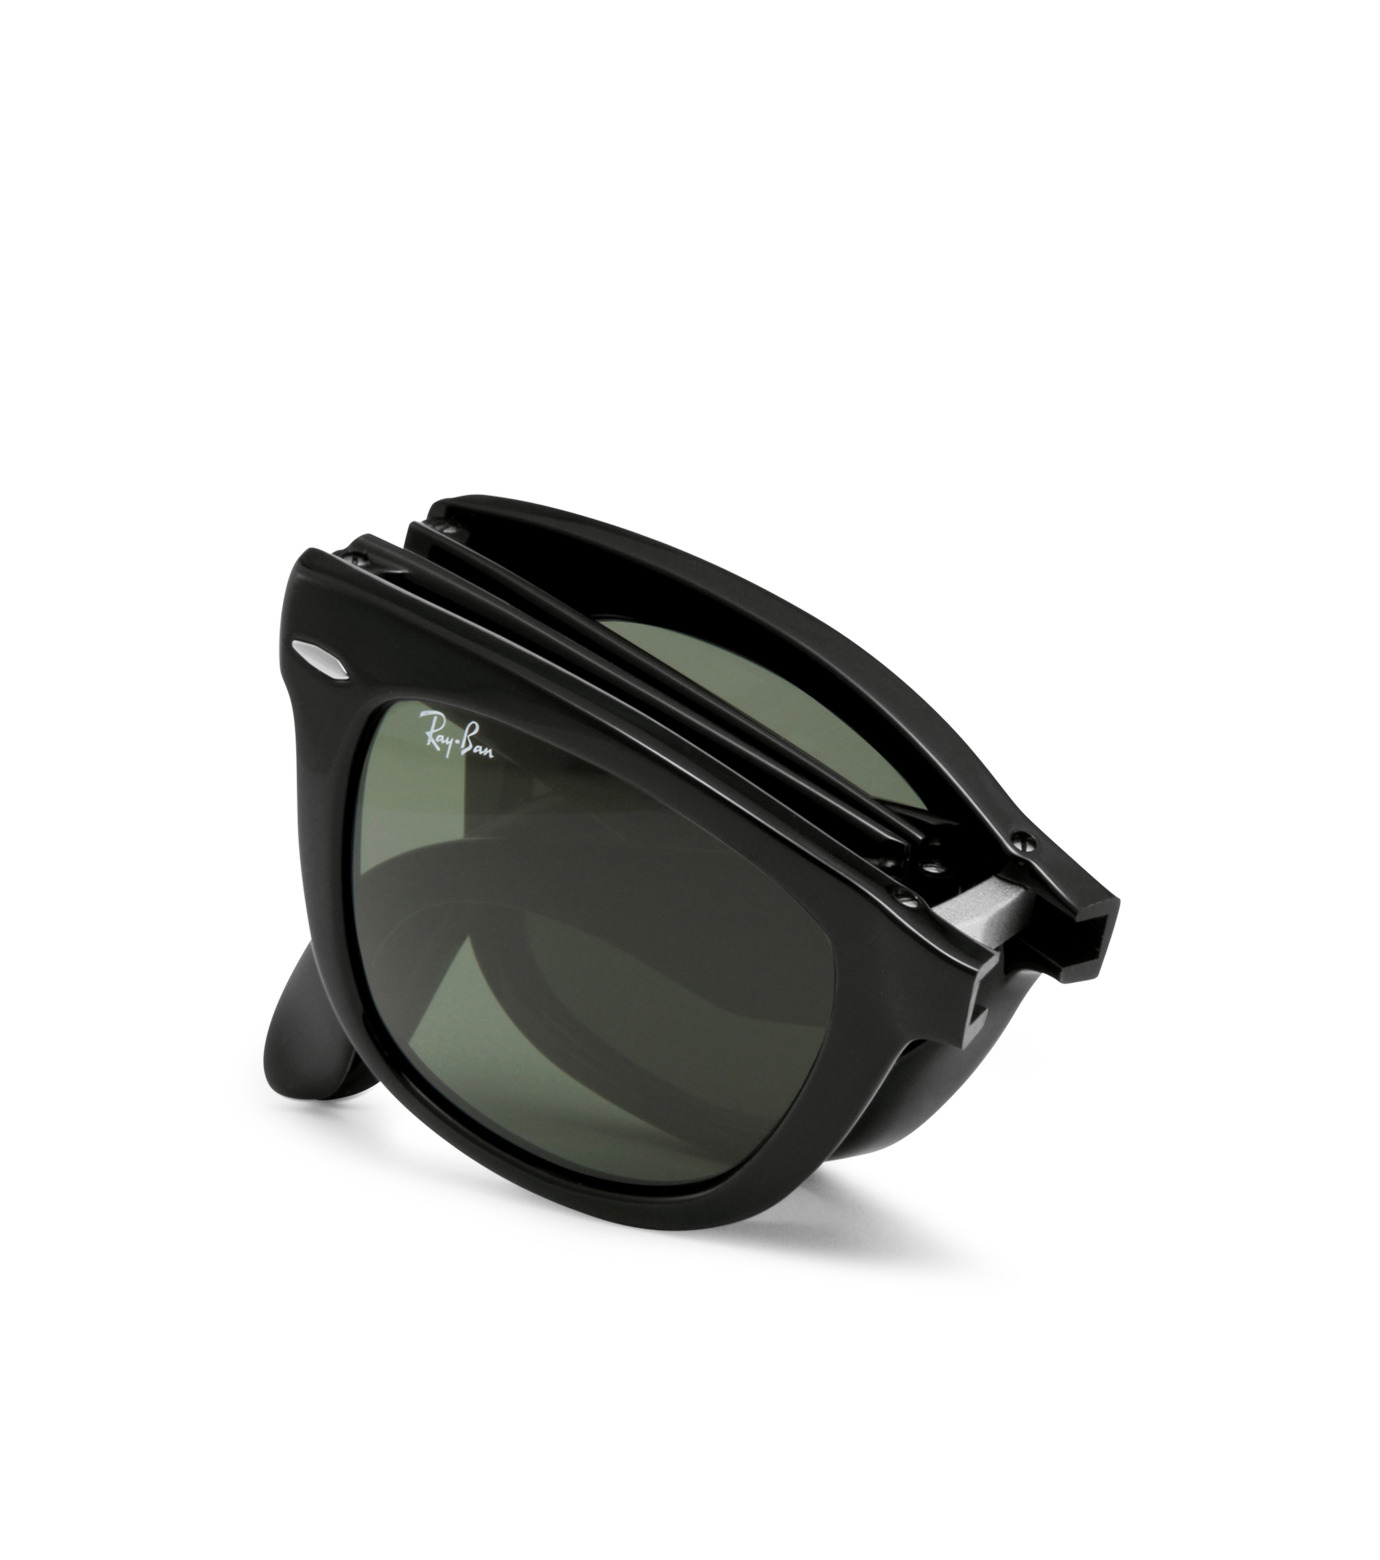 Ray-Ban(レイバン)のWayfarer Normal Black-BLACK(アイウェア/eyewear)-BR-4105-13 拡大詳細画像4